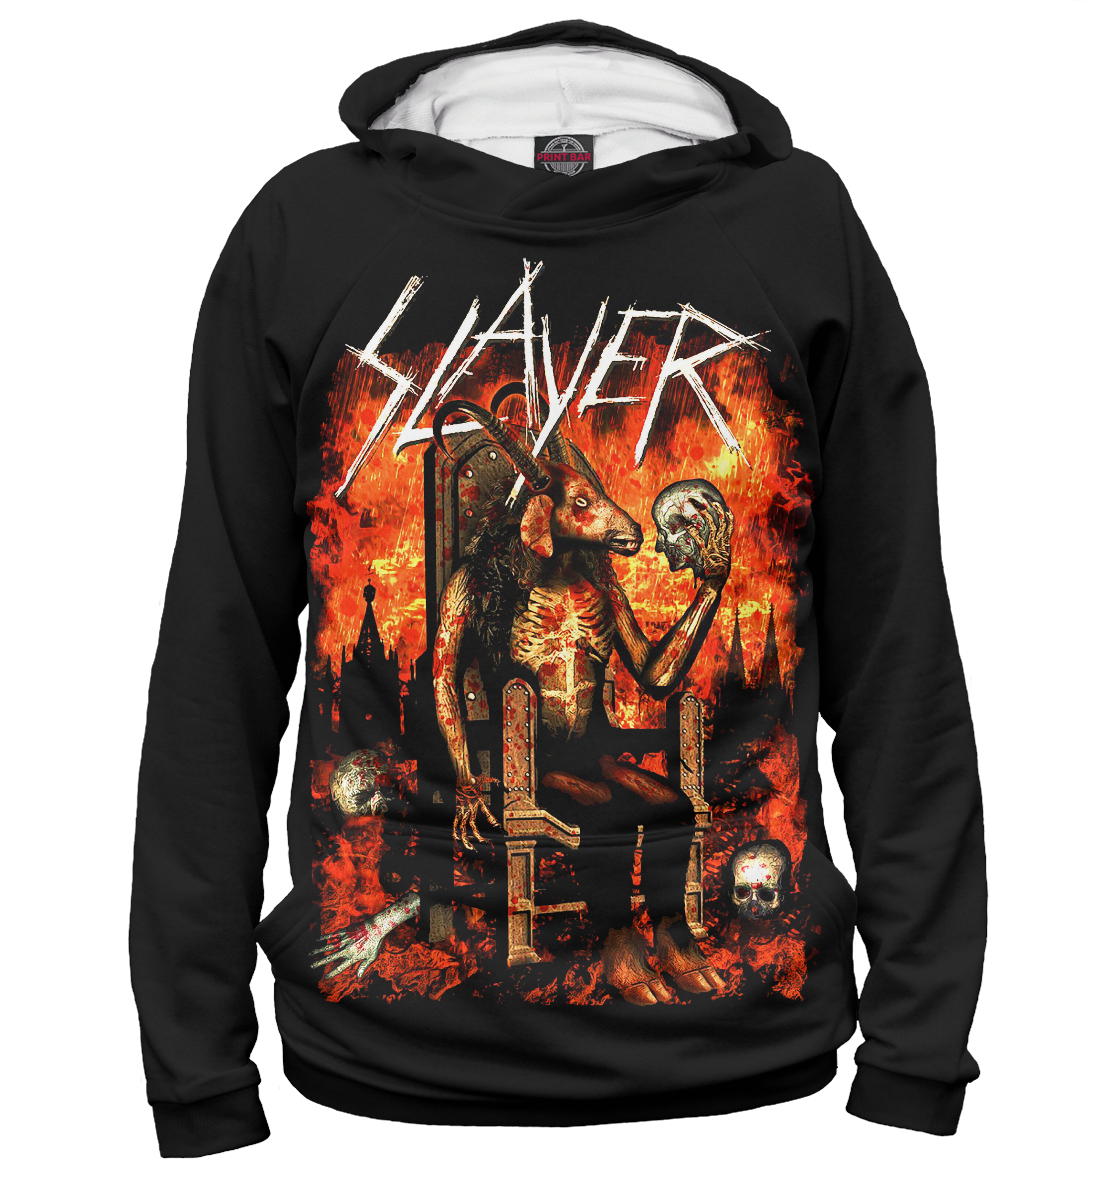 Slayer, Printbar, Худи, SLR-429357-hud-2  - купить со скидкой